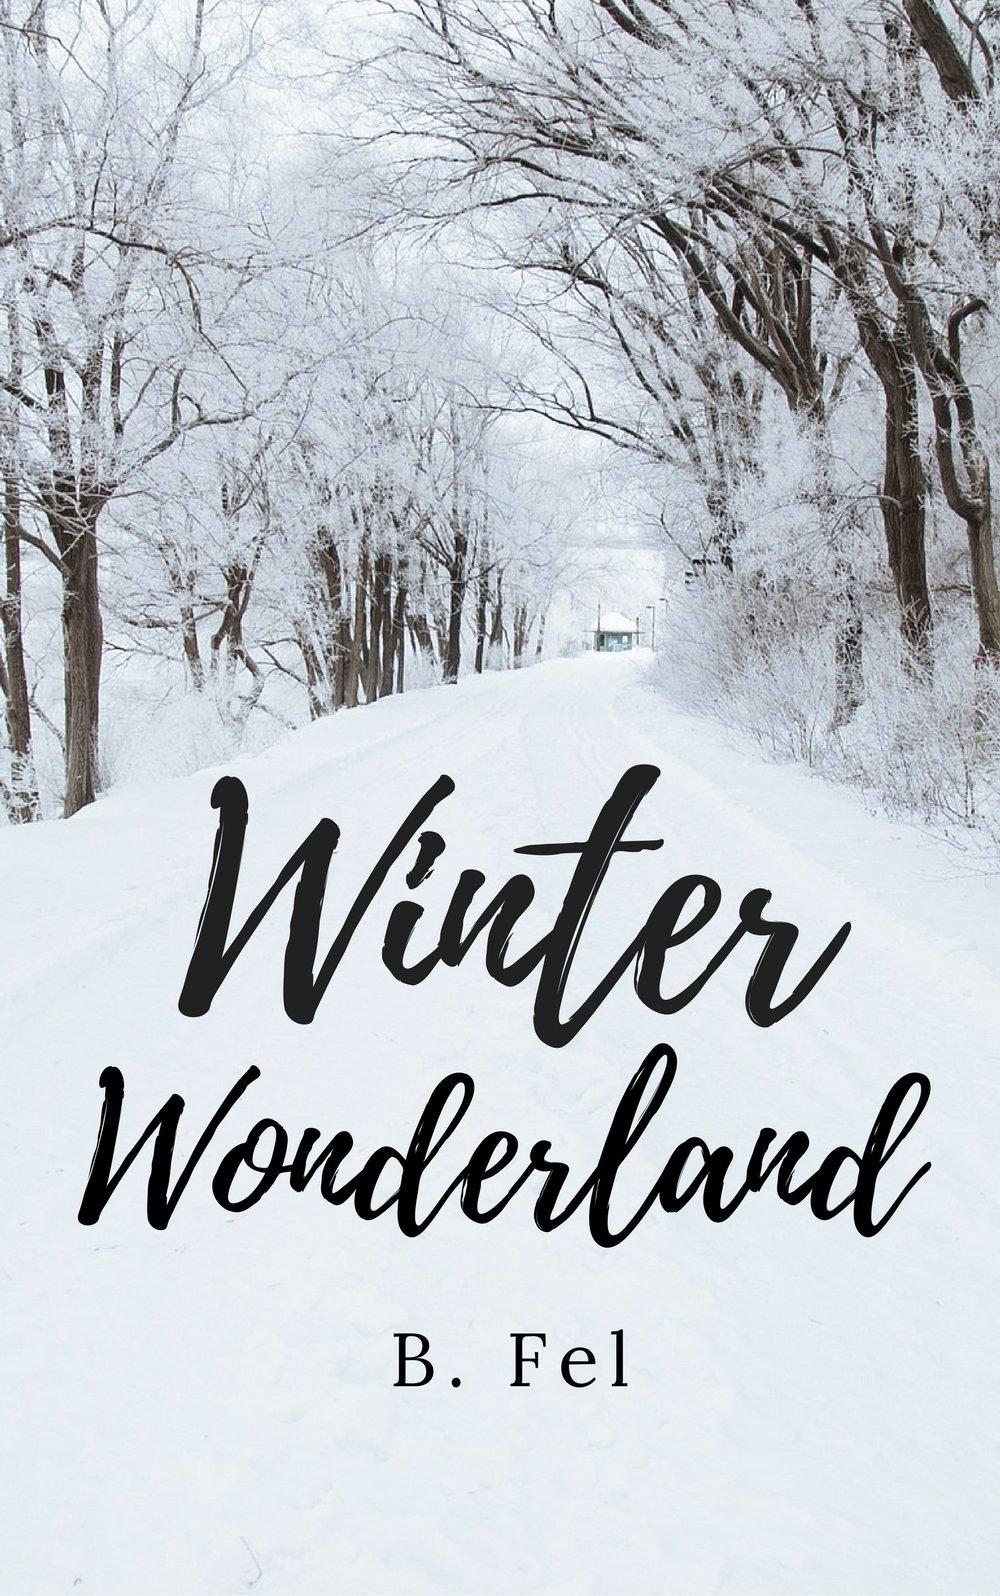 WinterWonderlandCoverNew2.jpg